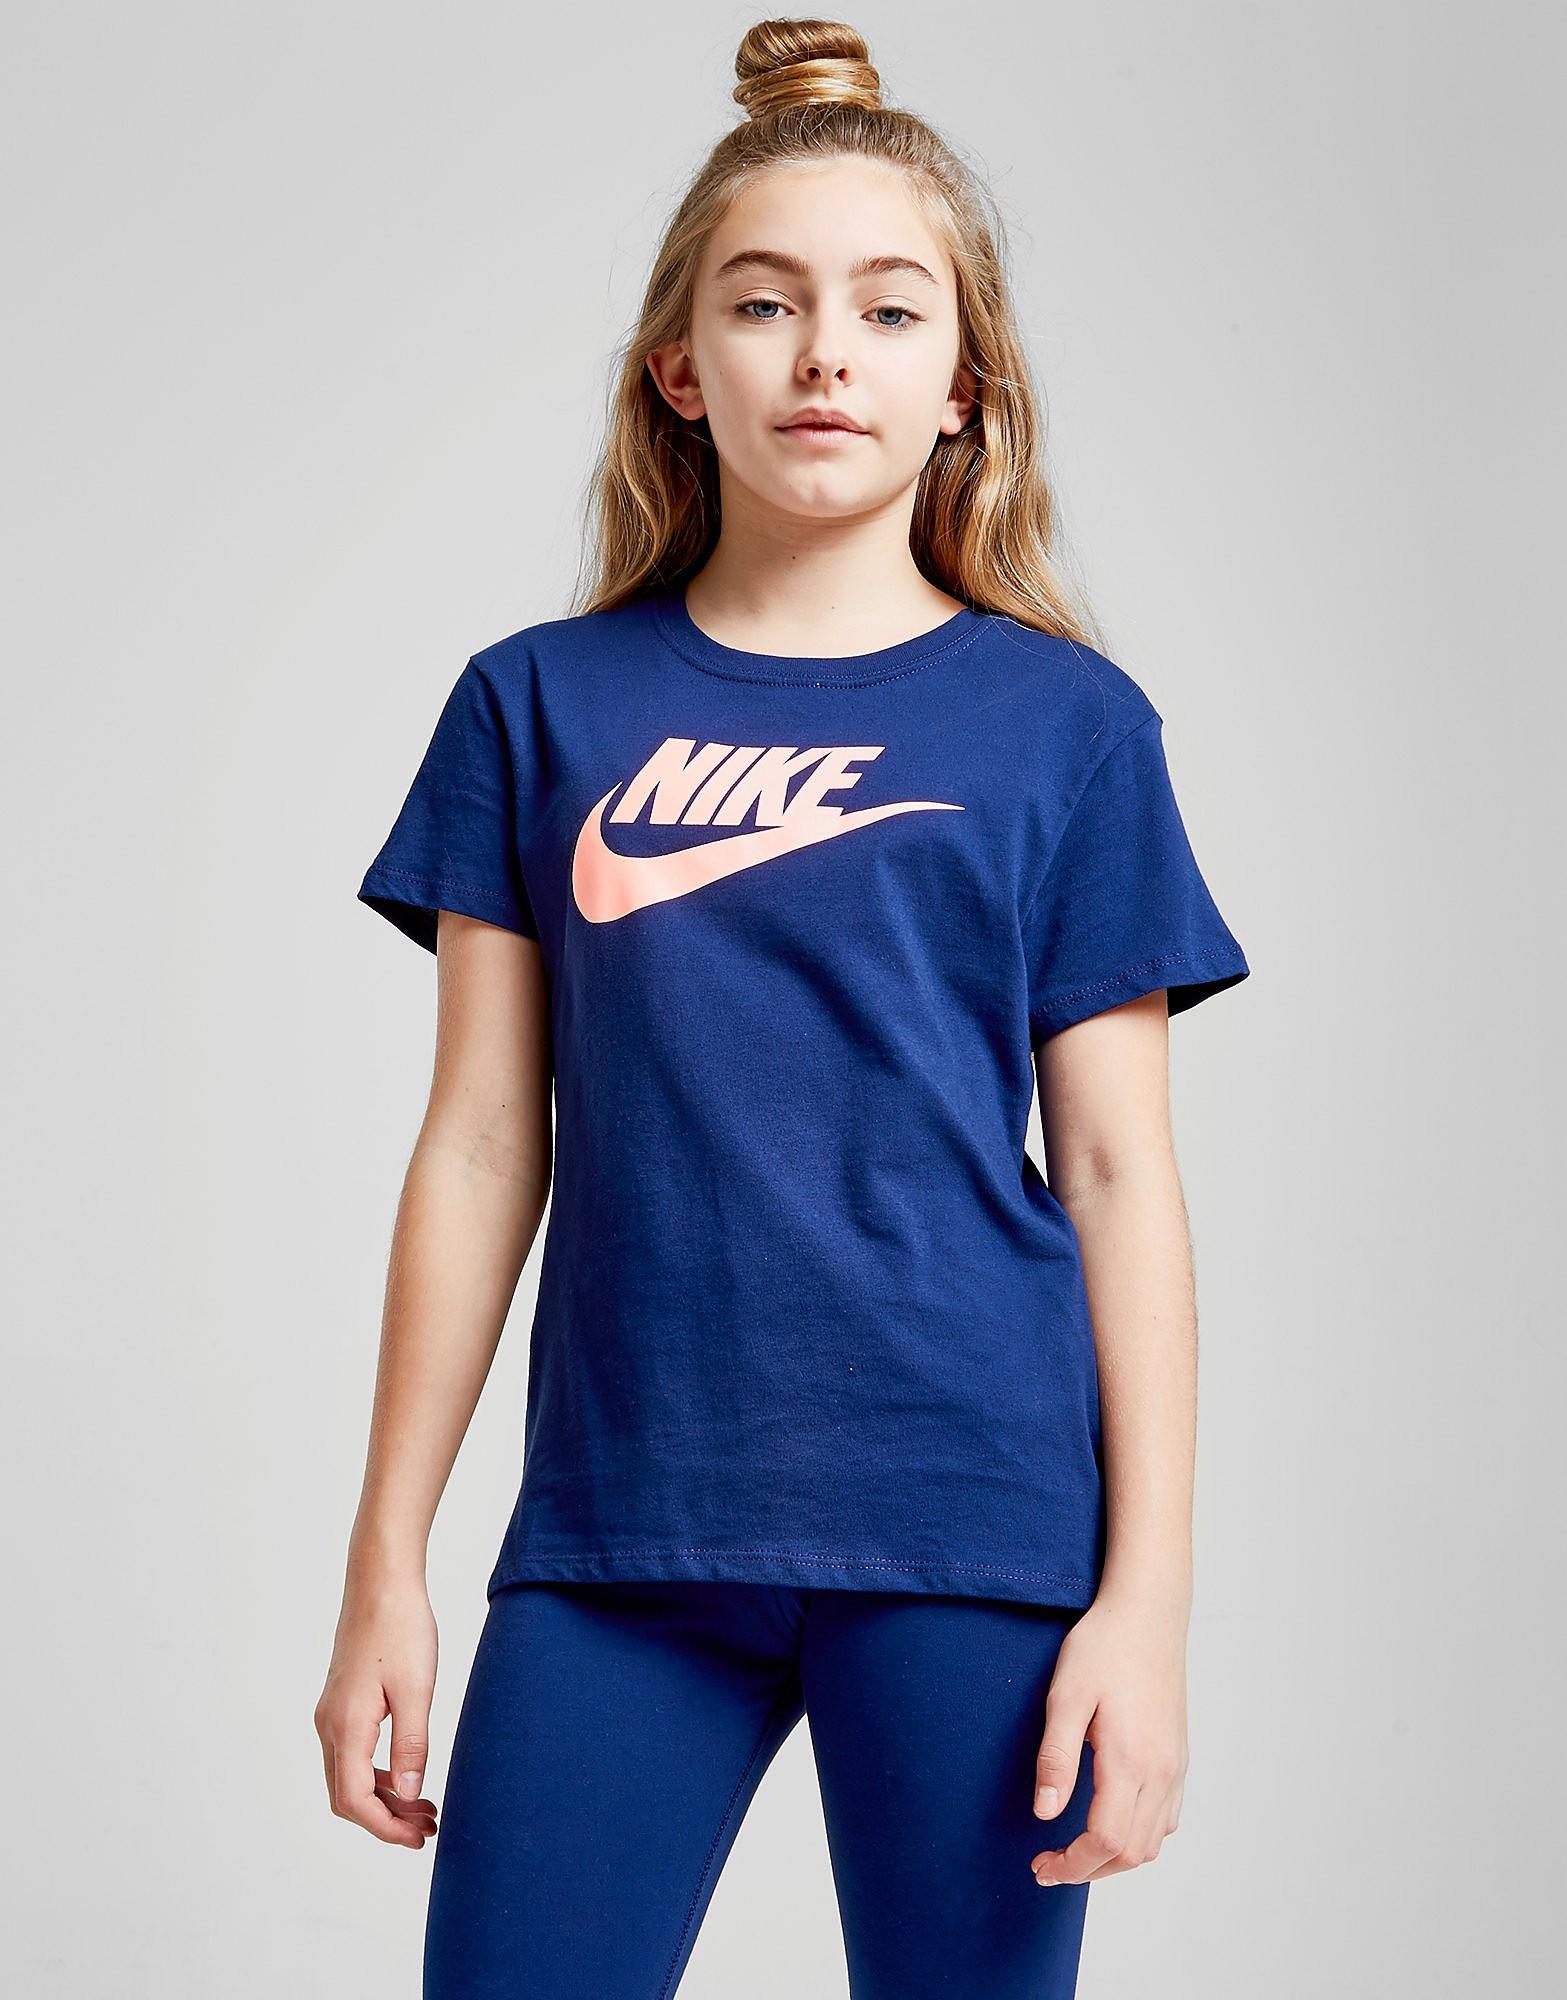 Nike Girls' Futura T-Shirt Junior - Blauw - Kind